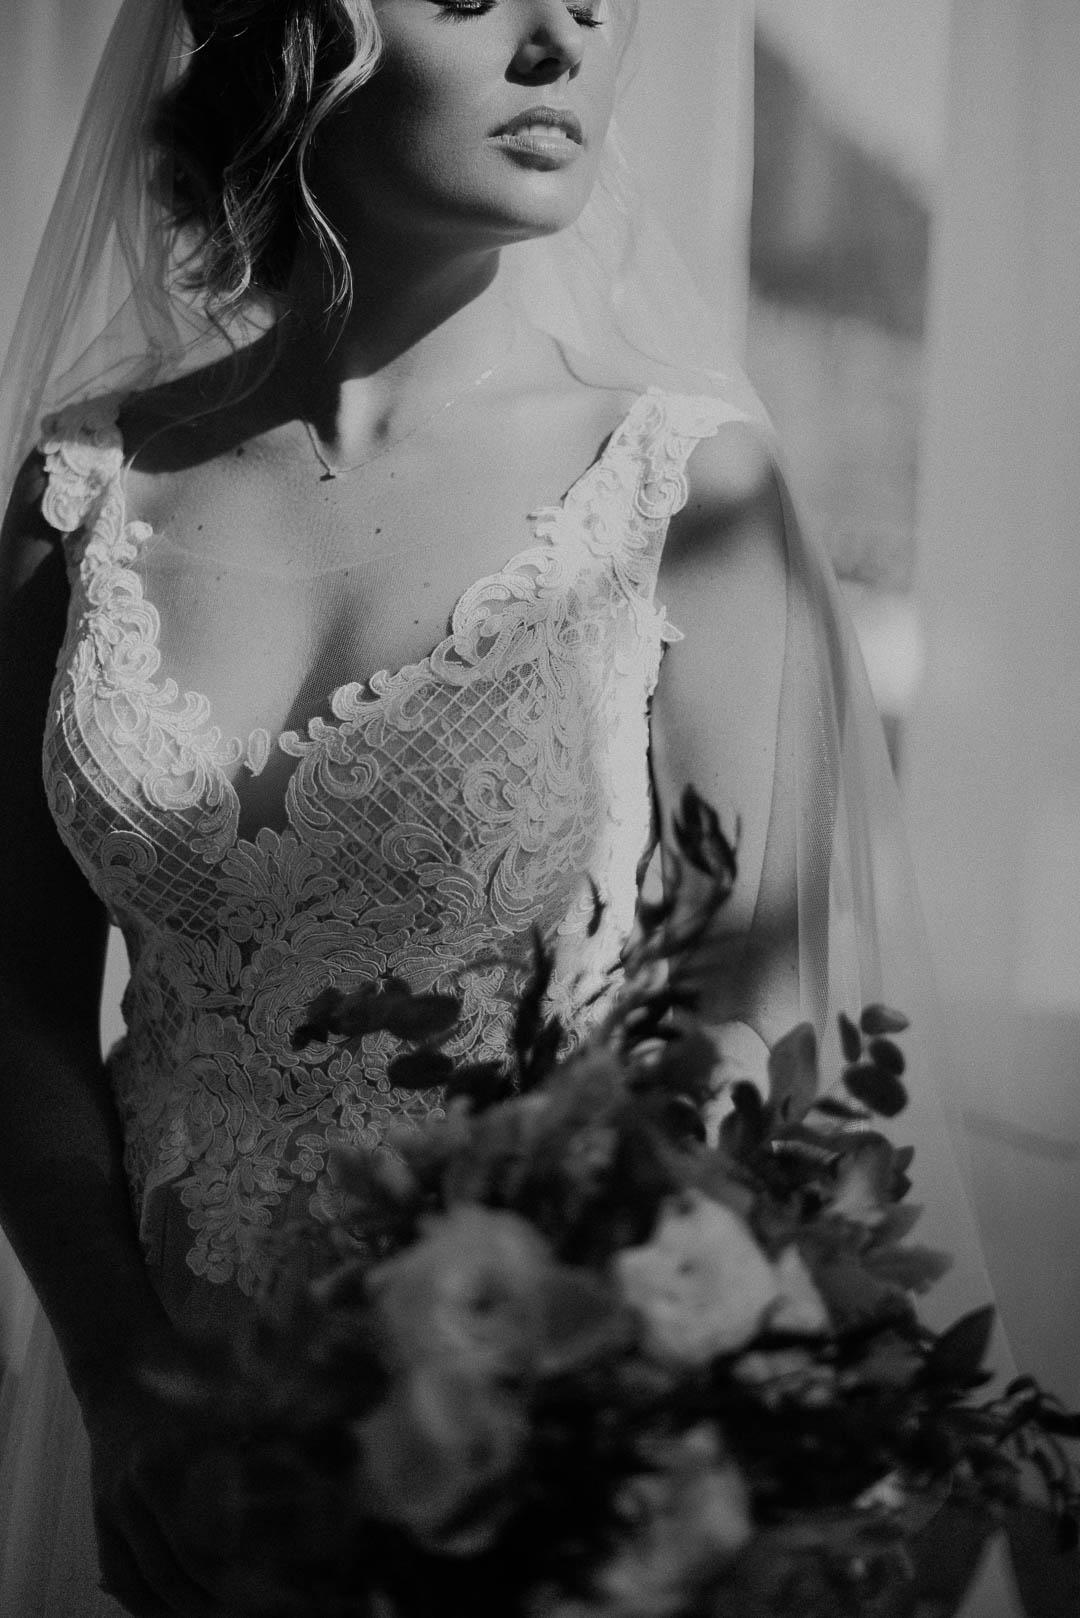 vivianeizzo-spazio46-wedding-photographer-destination-reportage-napoli-villacilento-33